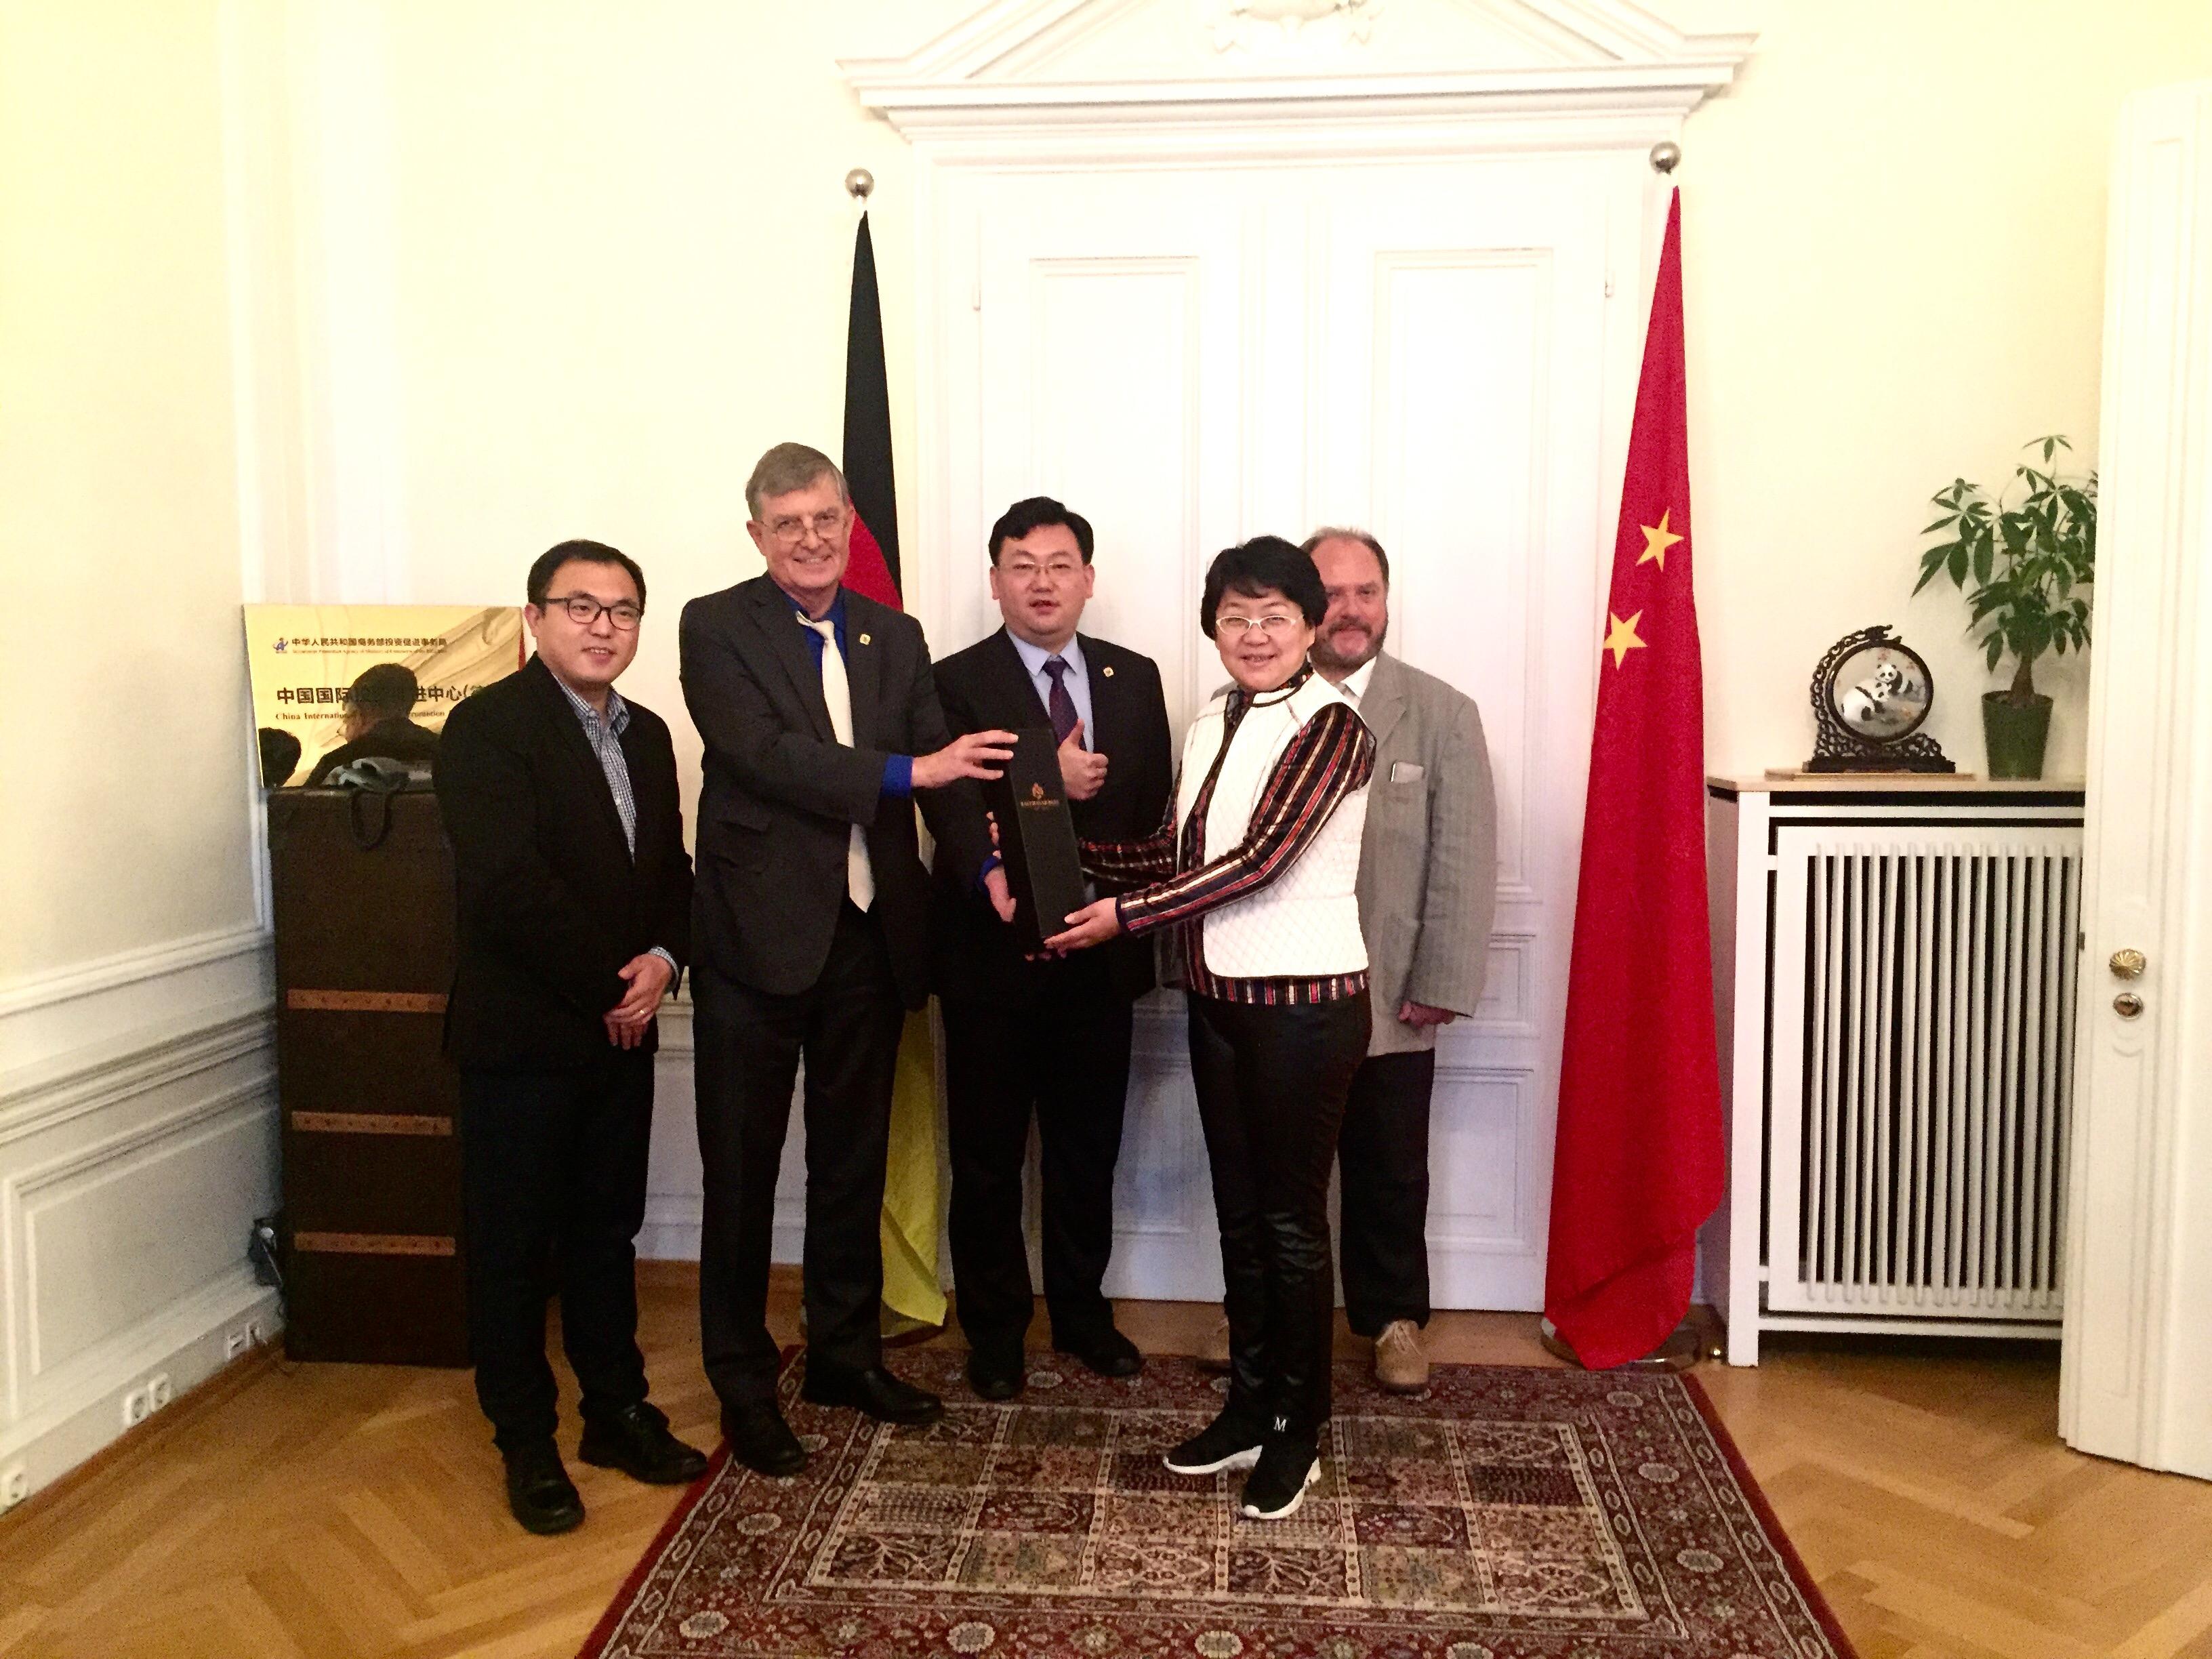 Übergabe einer Flasche Öko-Riesling an Ai Di–Chefin Meng, v.l.n.r. XIE Songtao, Dr. Borchmann, SONG Lei, MENG Su und Holger Diehl